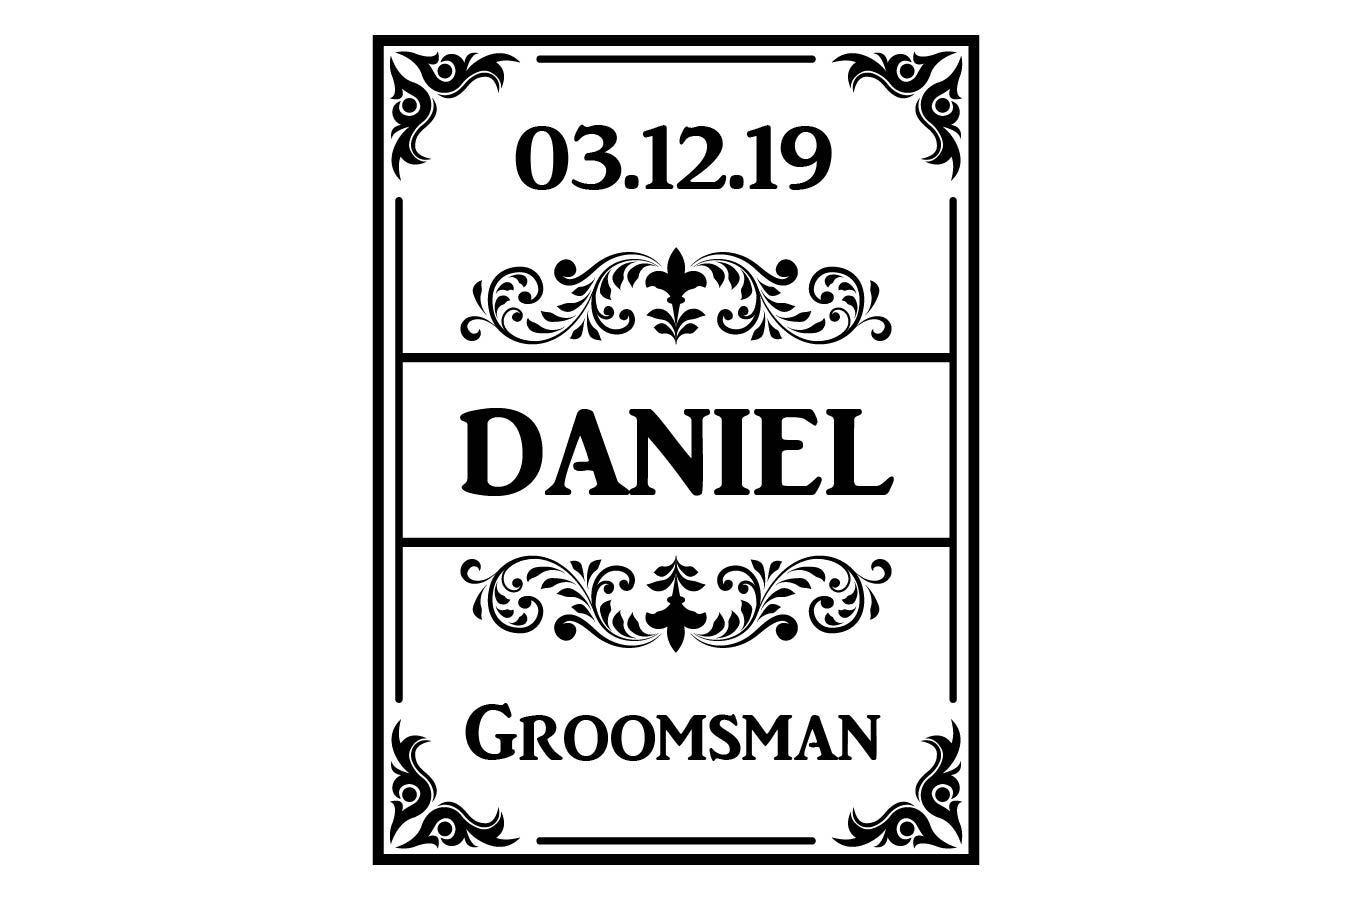 Daniels [+$5.00]